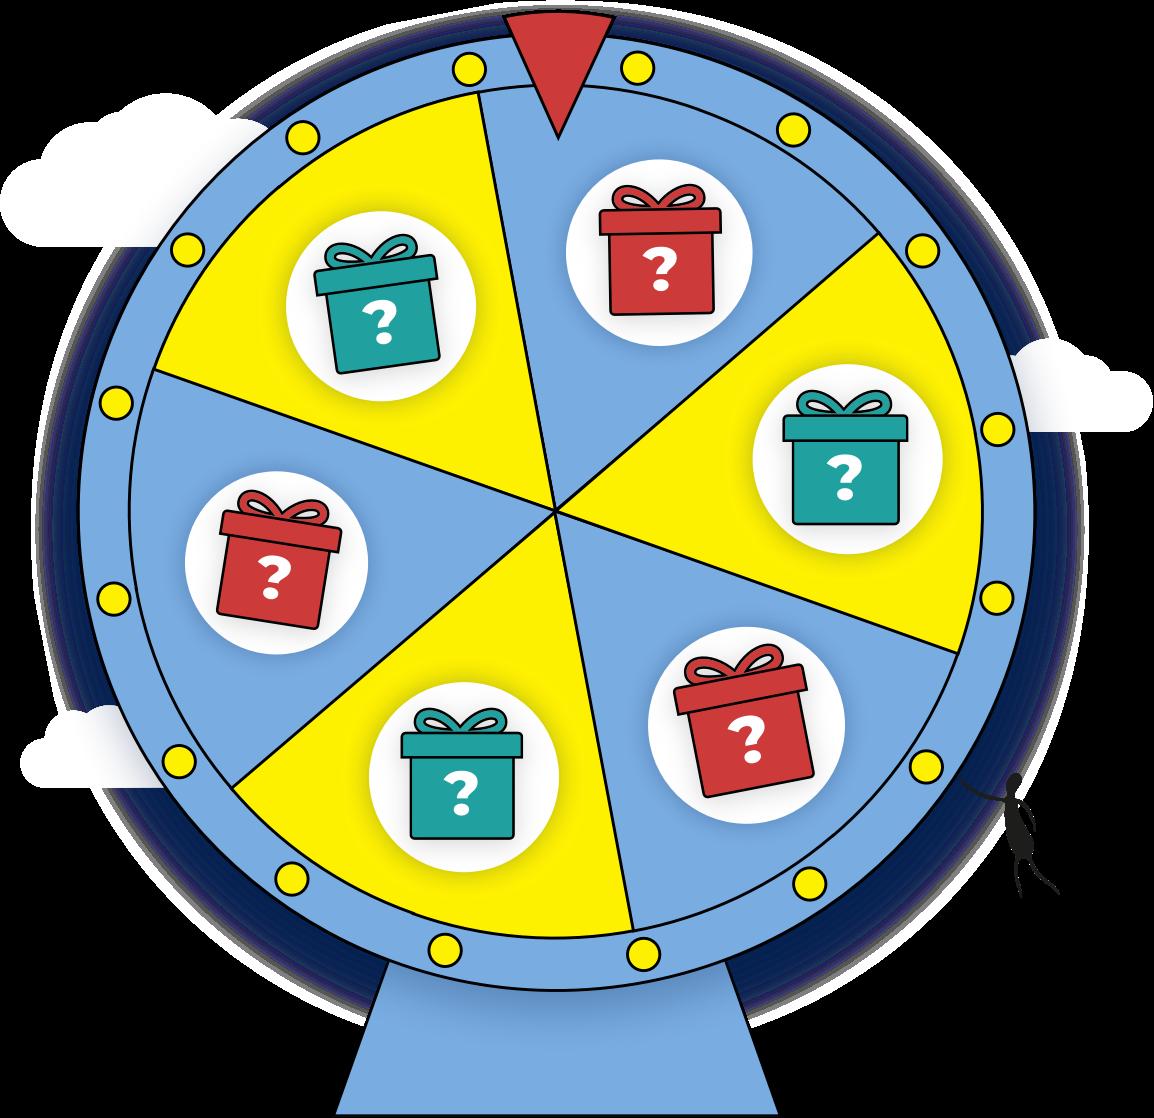 Karmacoin prize wheel